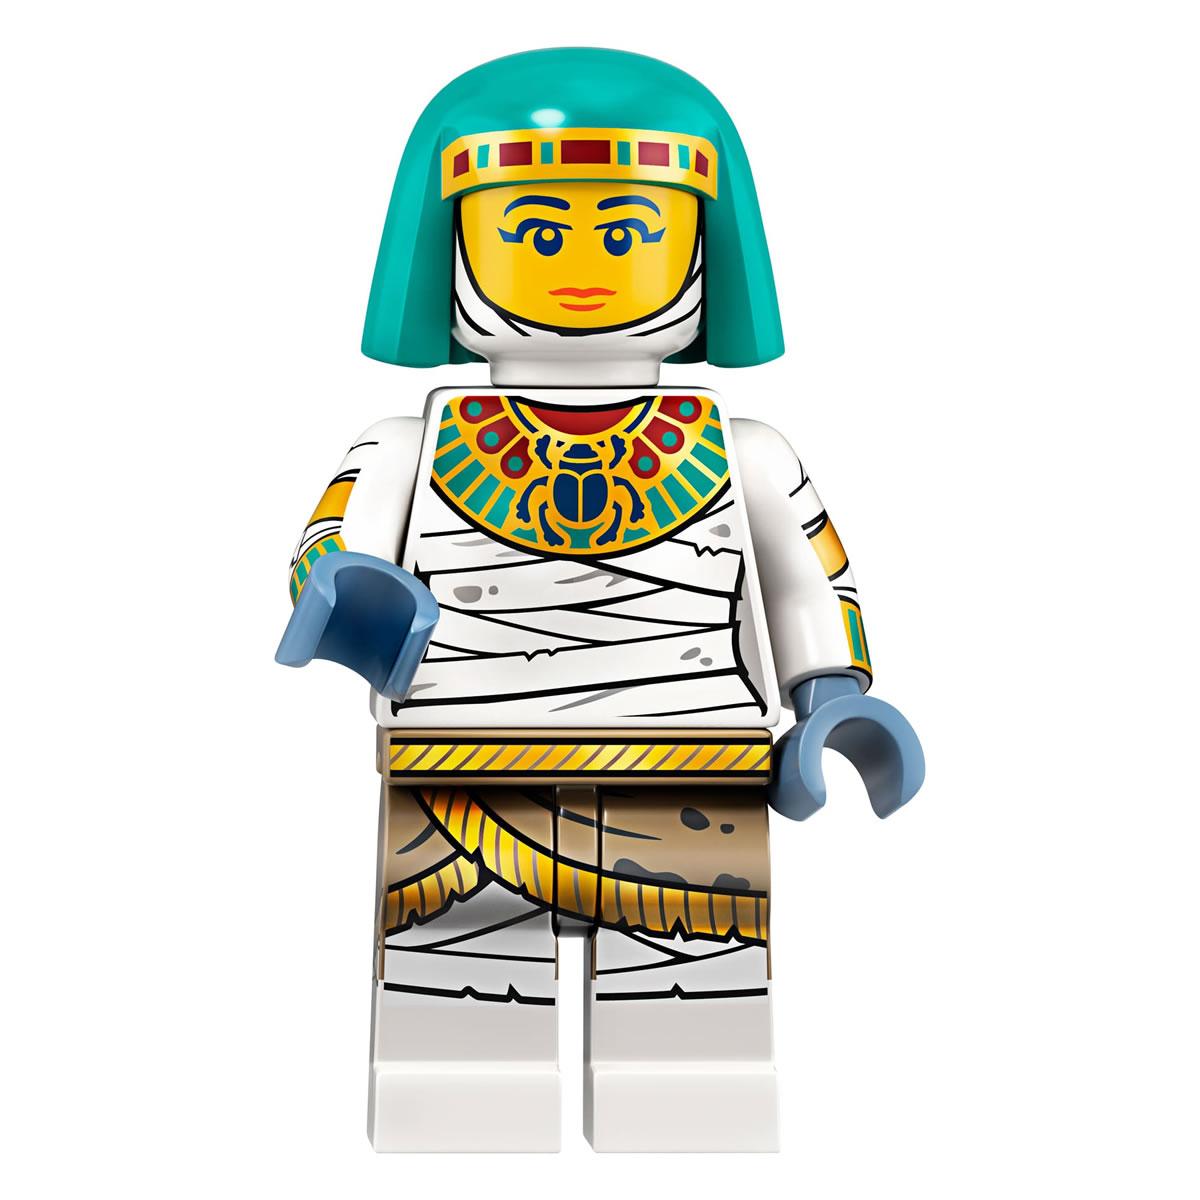 lego-minifiguren-sammelserie-collectible-minifigures-serie-19-71025-2019-9 zusammengebaut.com